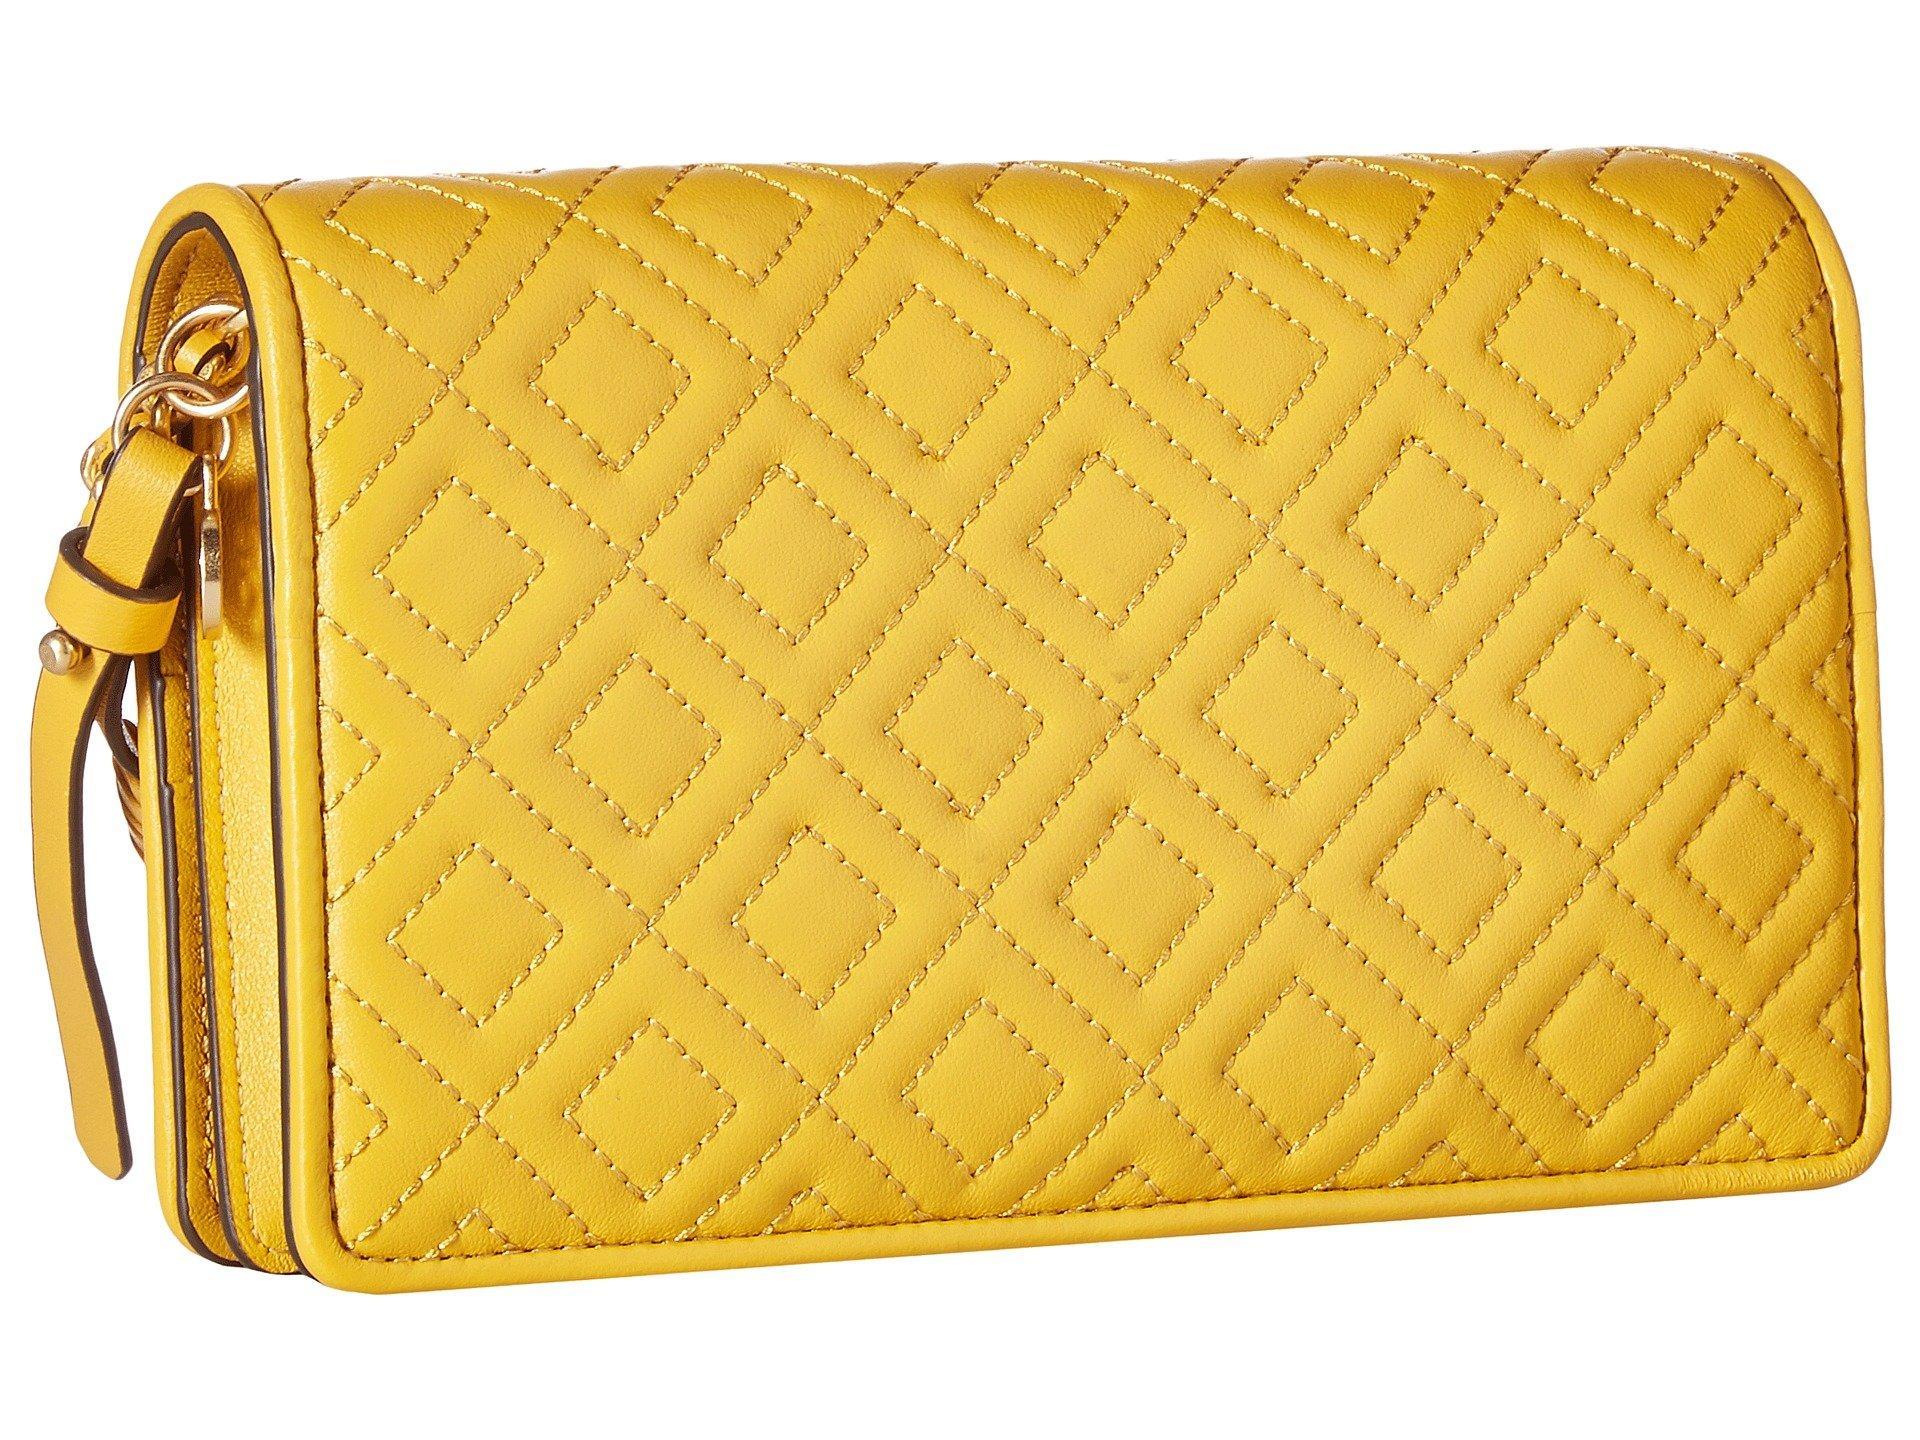 f5859e69a49b Tory Burch - Yellow Fleming Flat Wallet Crossbody - Lyst. View fullscreen